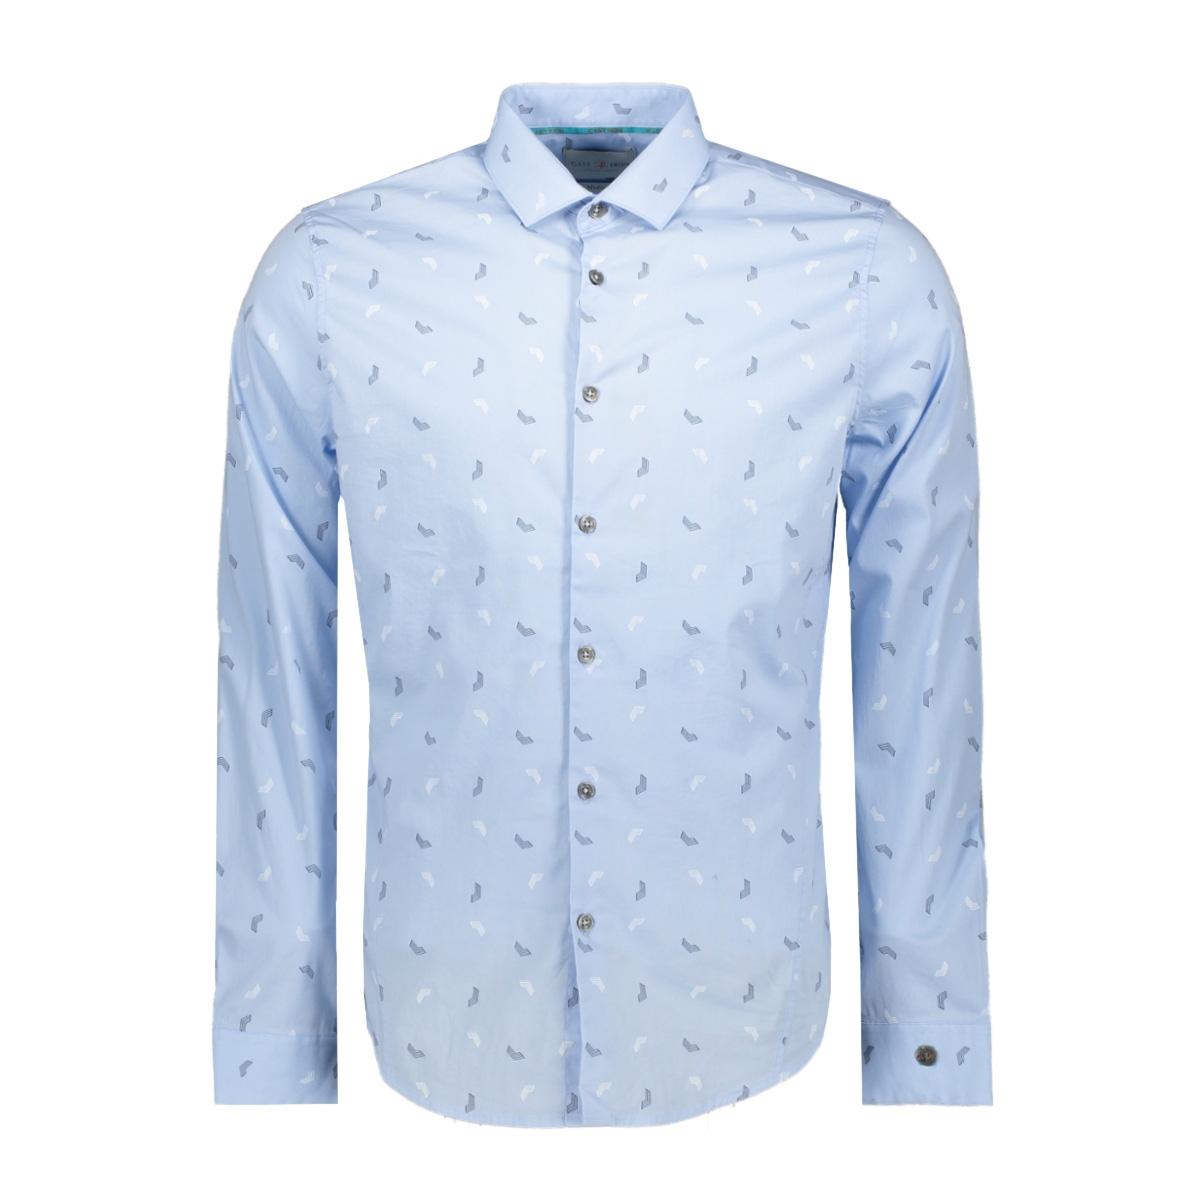 printed shirt csi198658 cast iron overhemd 5300